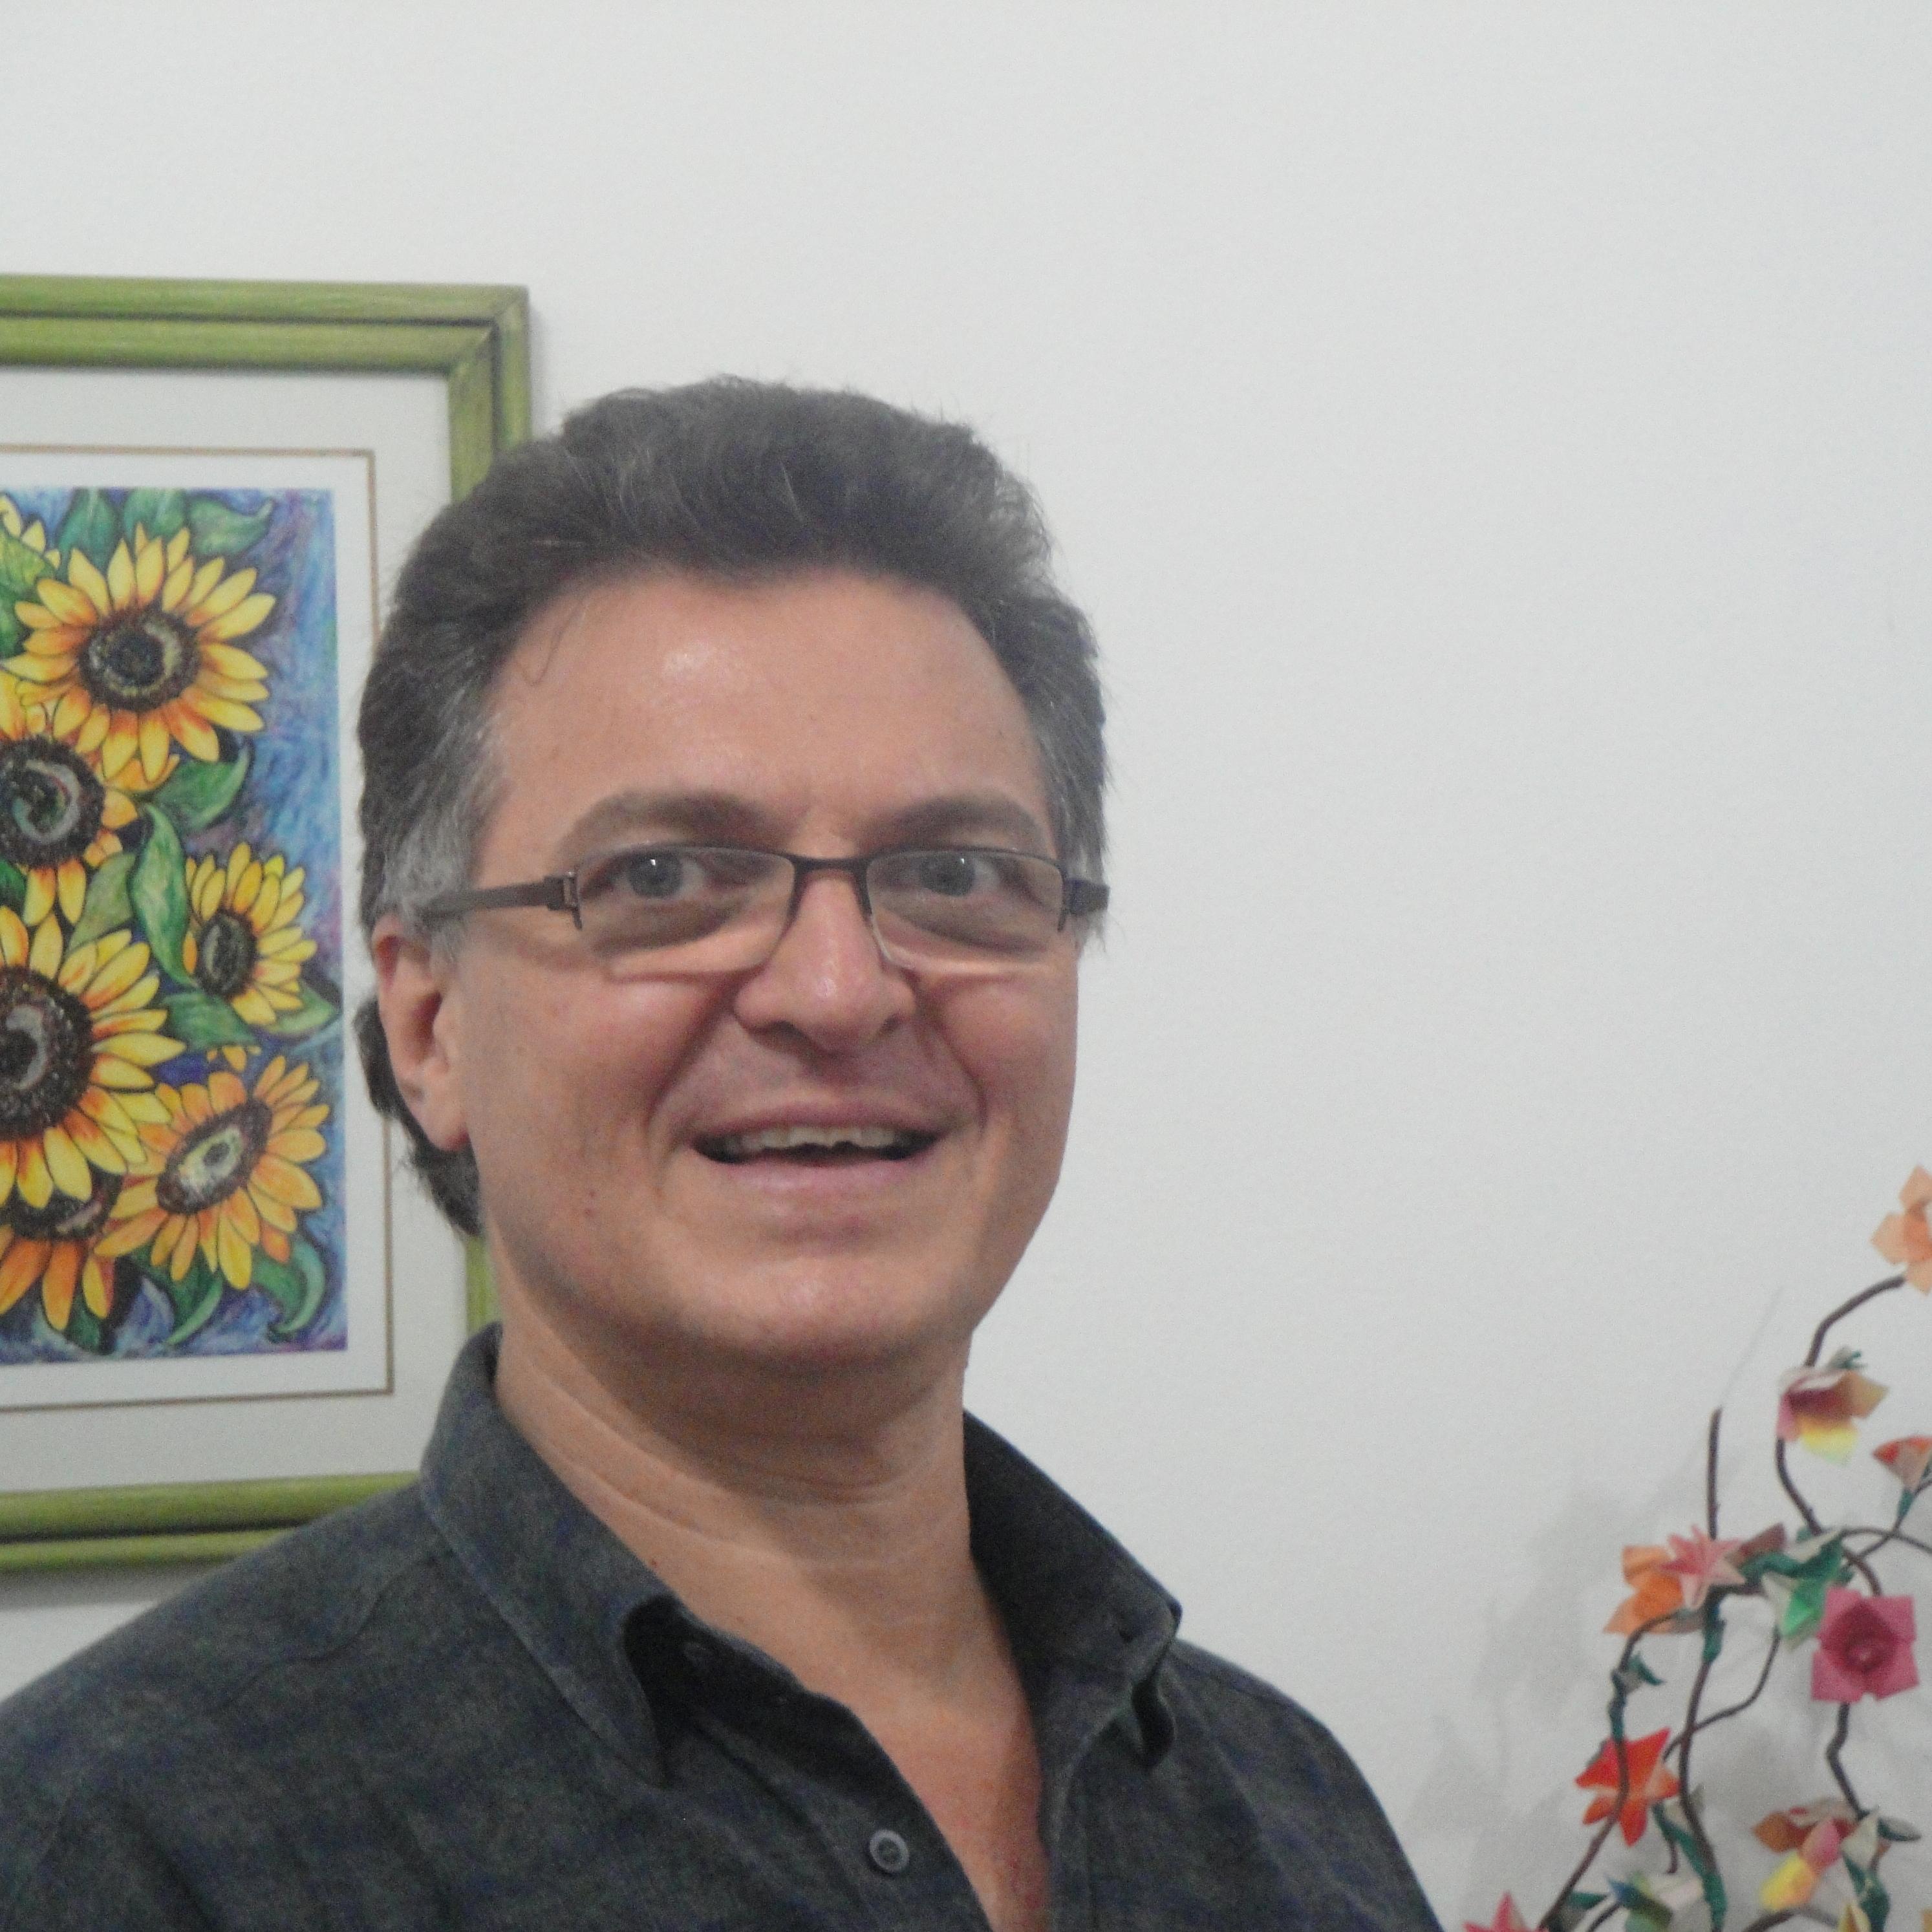 Angelo Piovesan